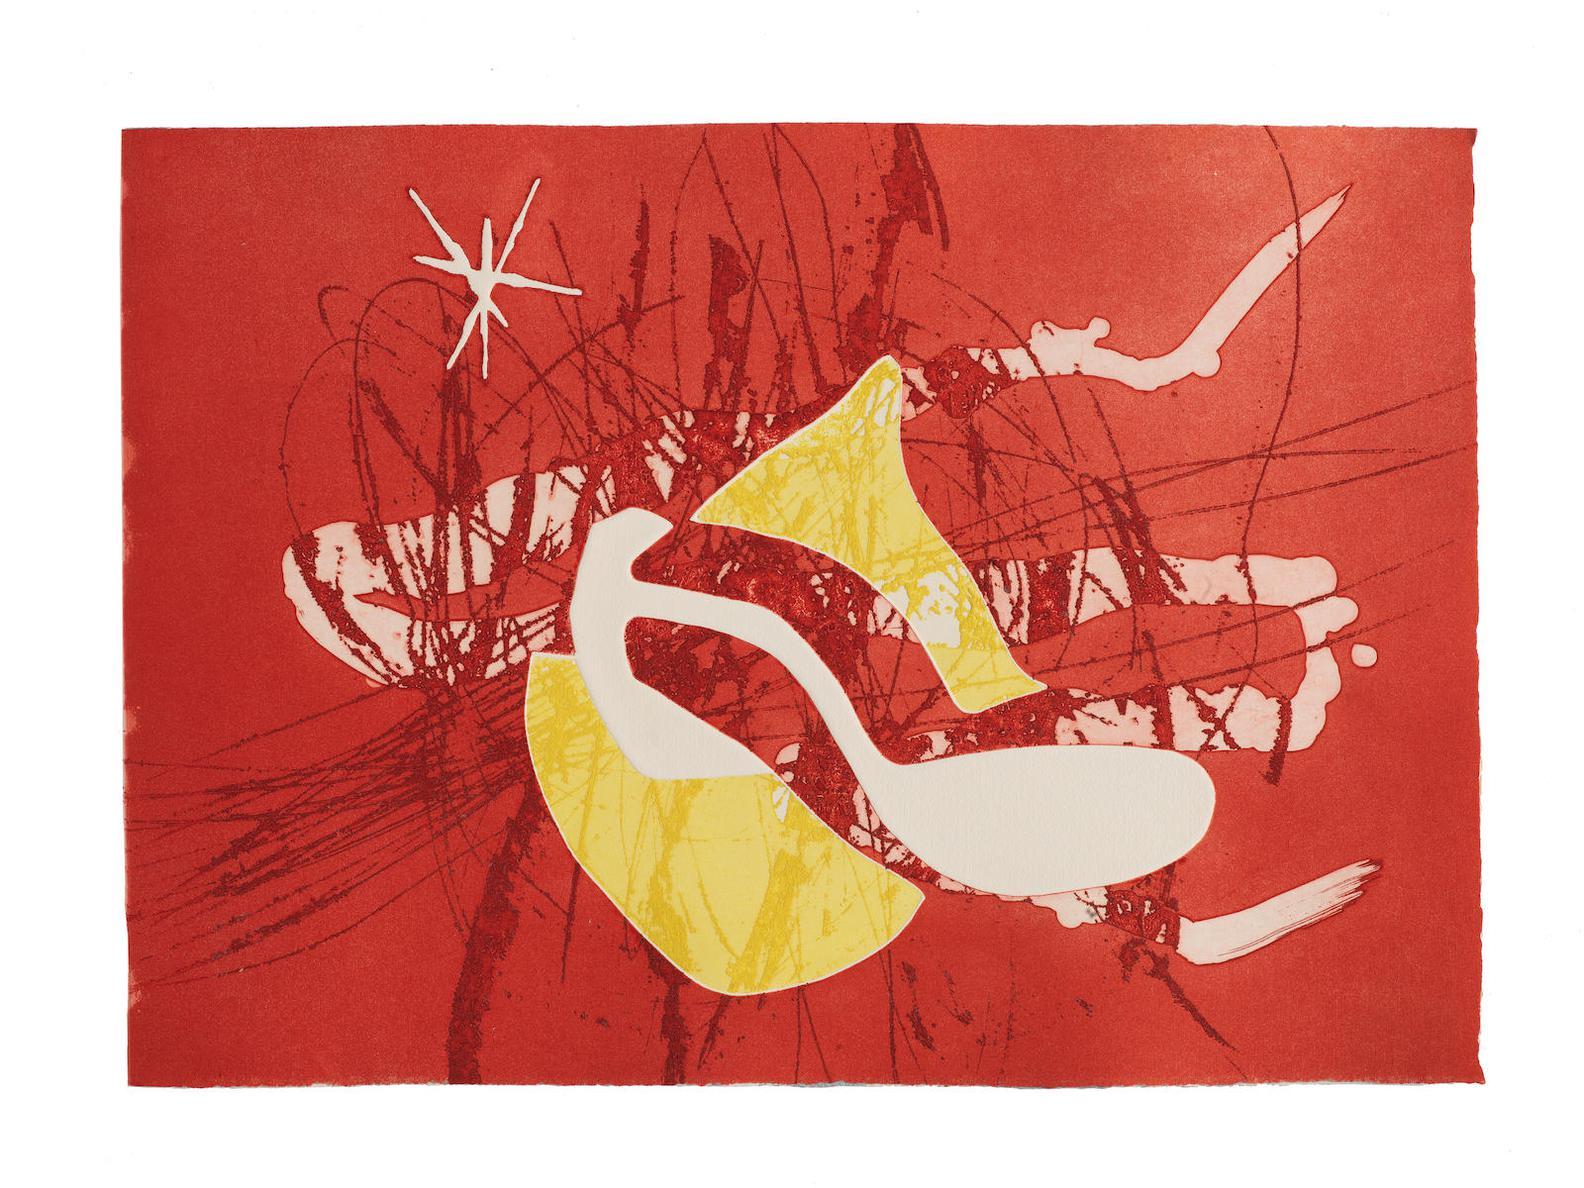 Joan Miro-Francesc Dassis, Cantic Del Sol, Editorial Gustavo Gili, Barcelona, 1975 (Cramer Books 196; Dupin 833-867)-1975